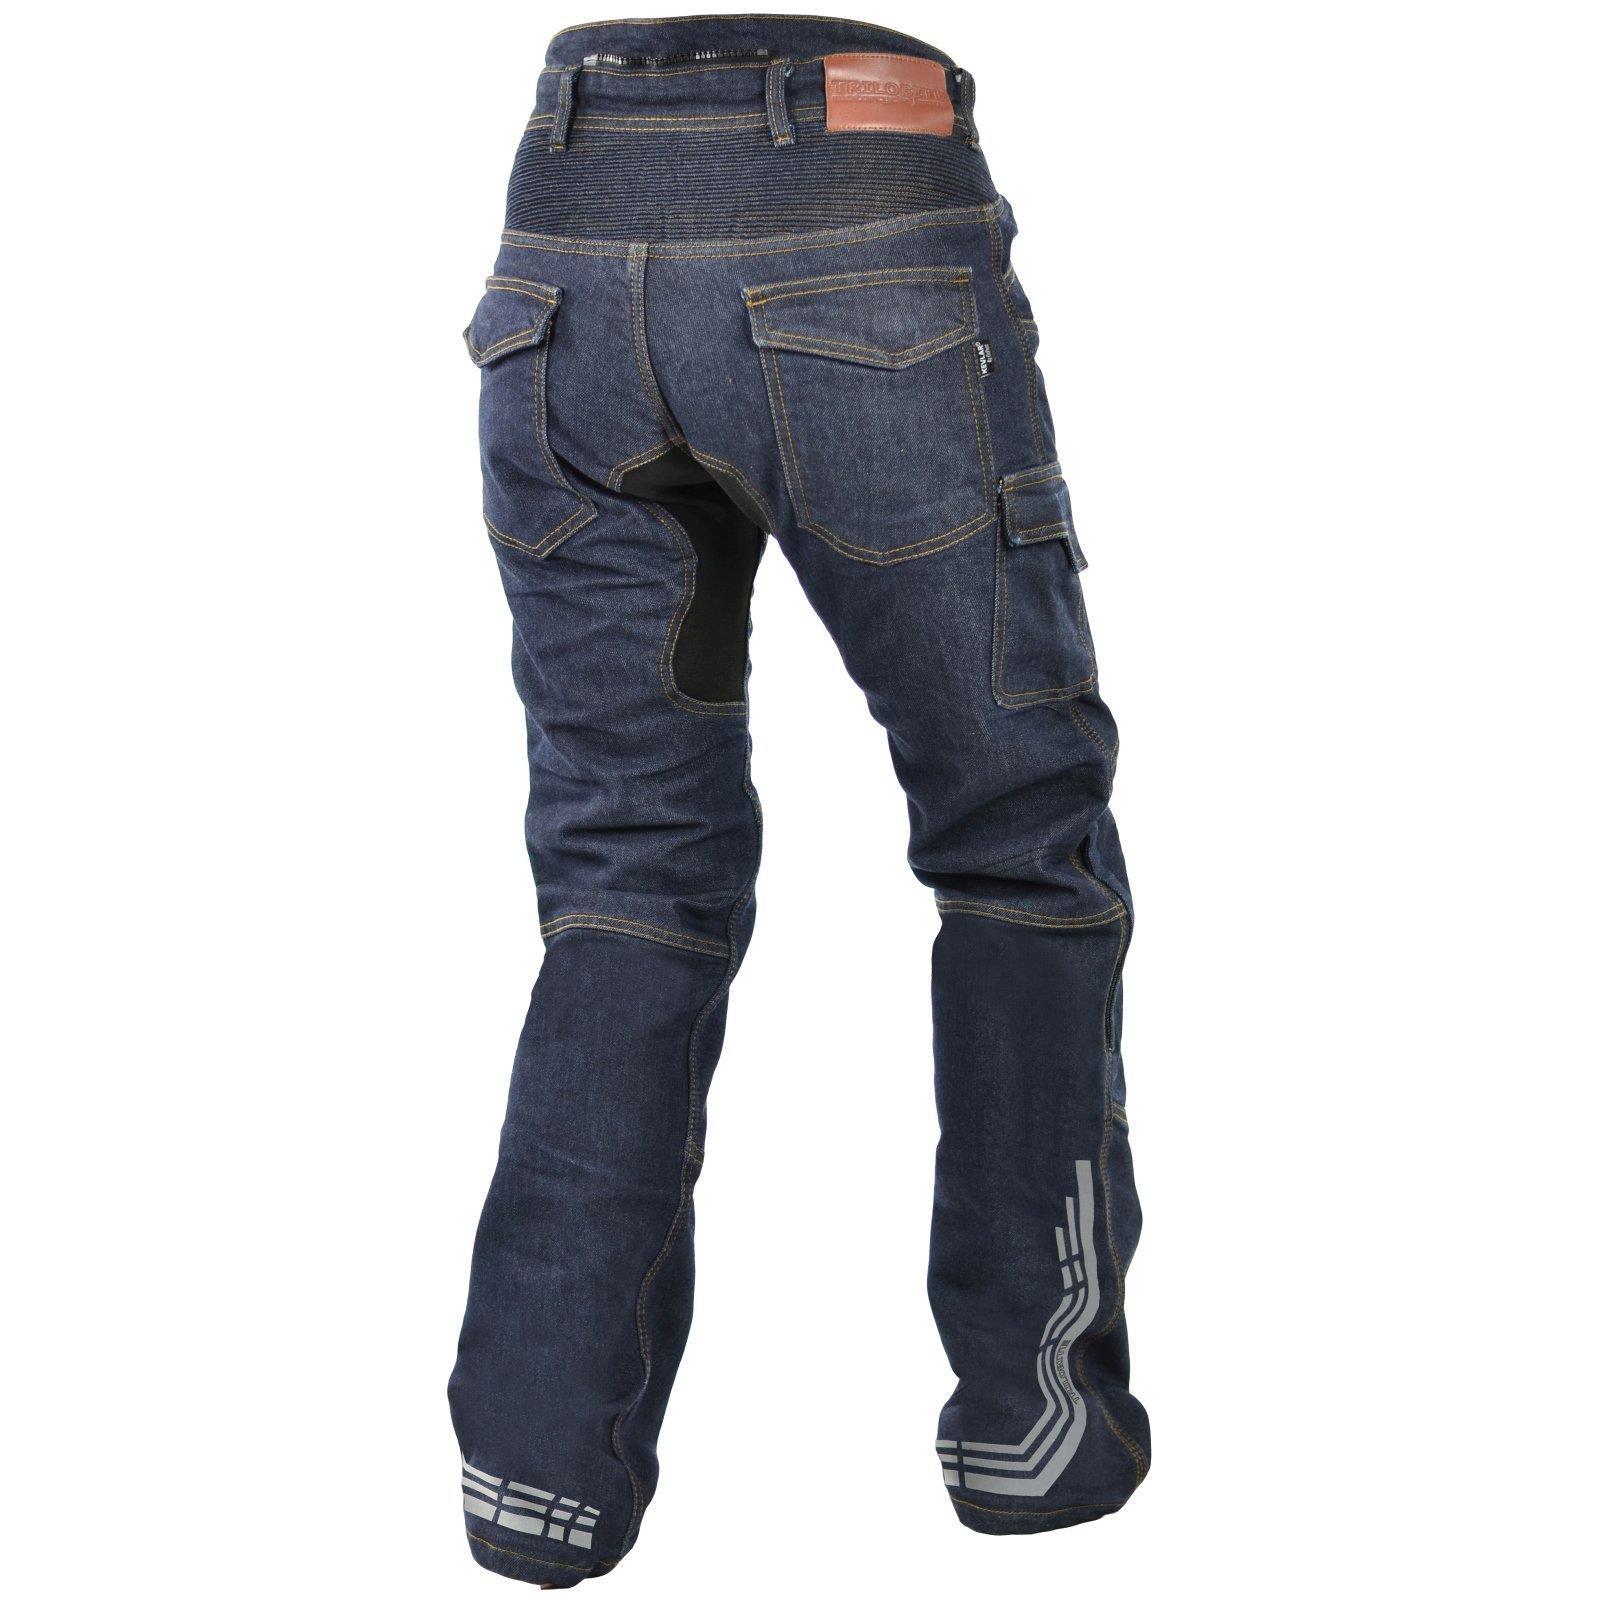 Trilobite-Pantaloni-Moto-Jeans-Abbigliamento-Parado-MICAS-URBAN-DUAL-PANTS-ACID miniatura 88